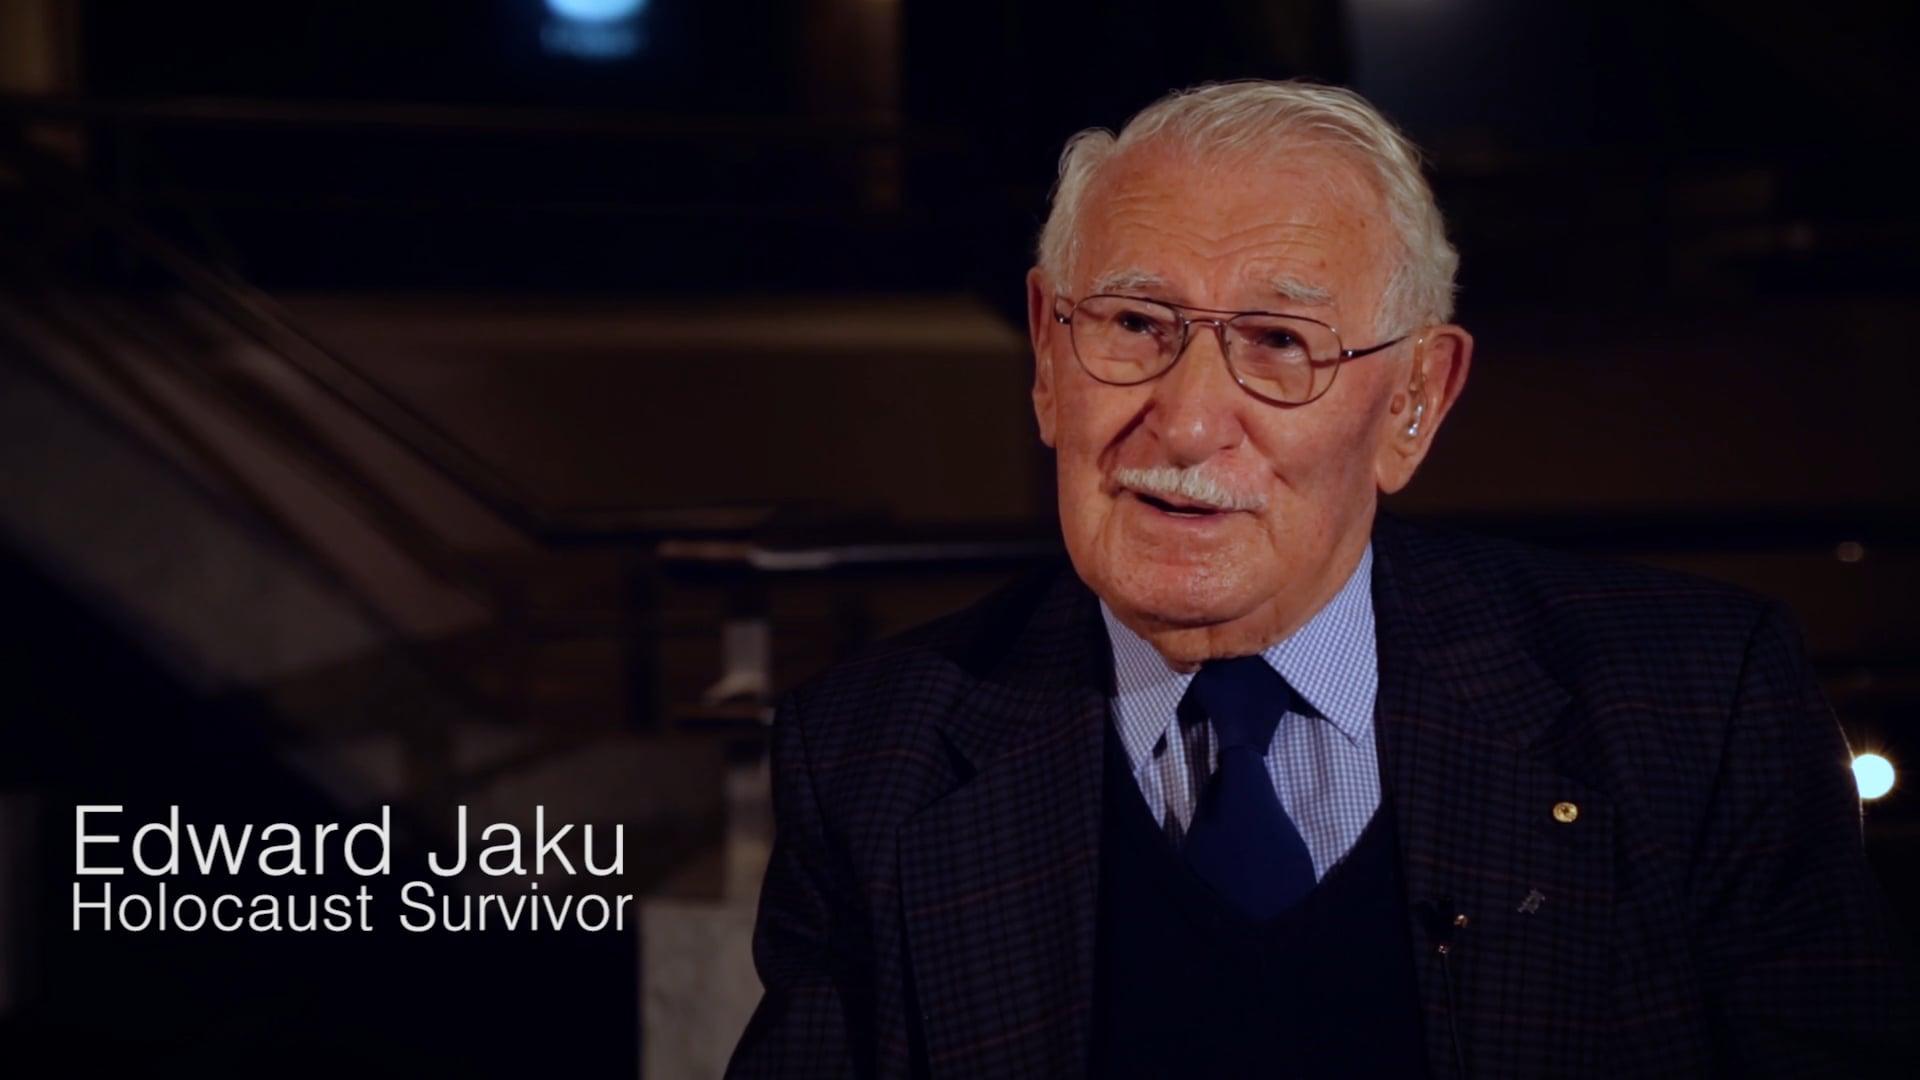 Documentary: A Voice For Six Million